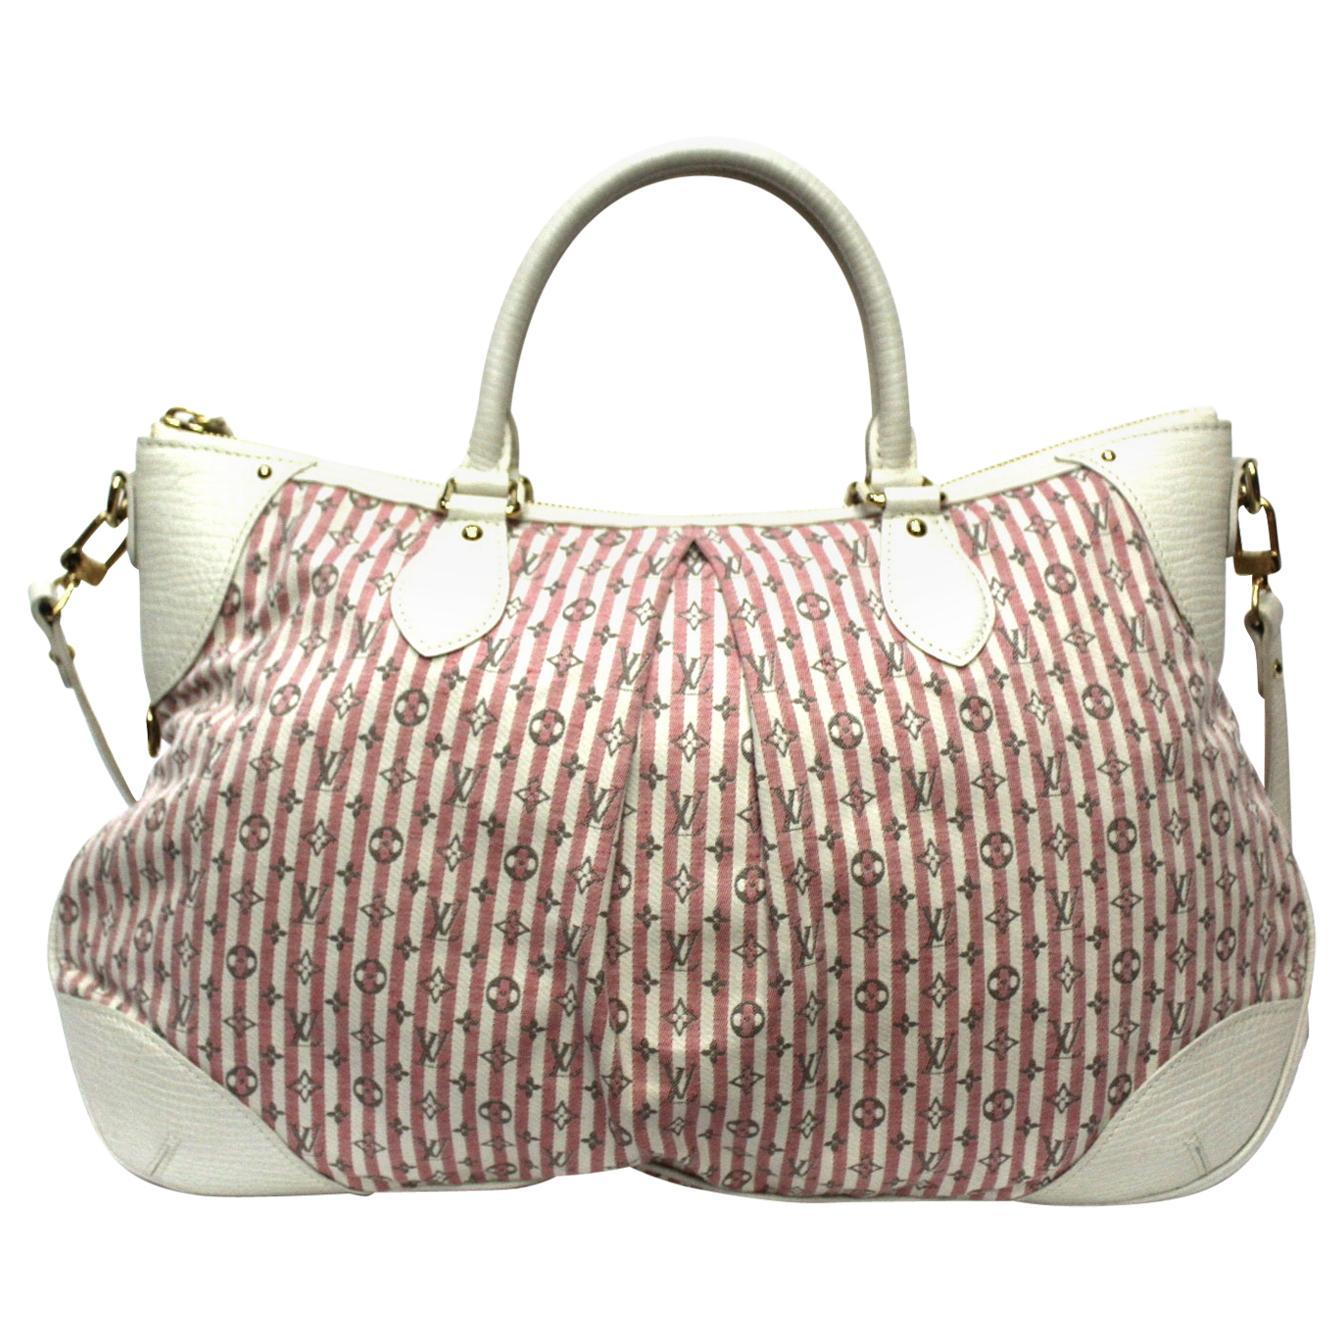 Louis Vuitton White and Pink Canvas Croisette Marina Mini Lin Bag